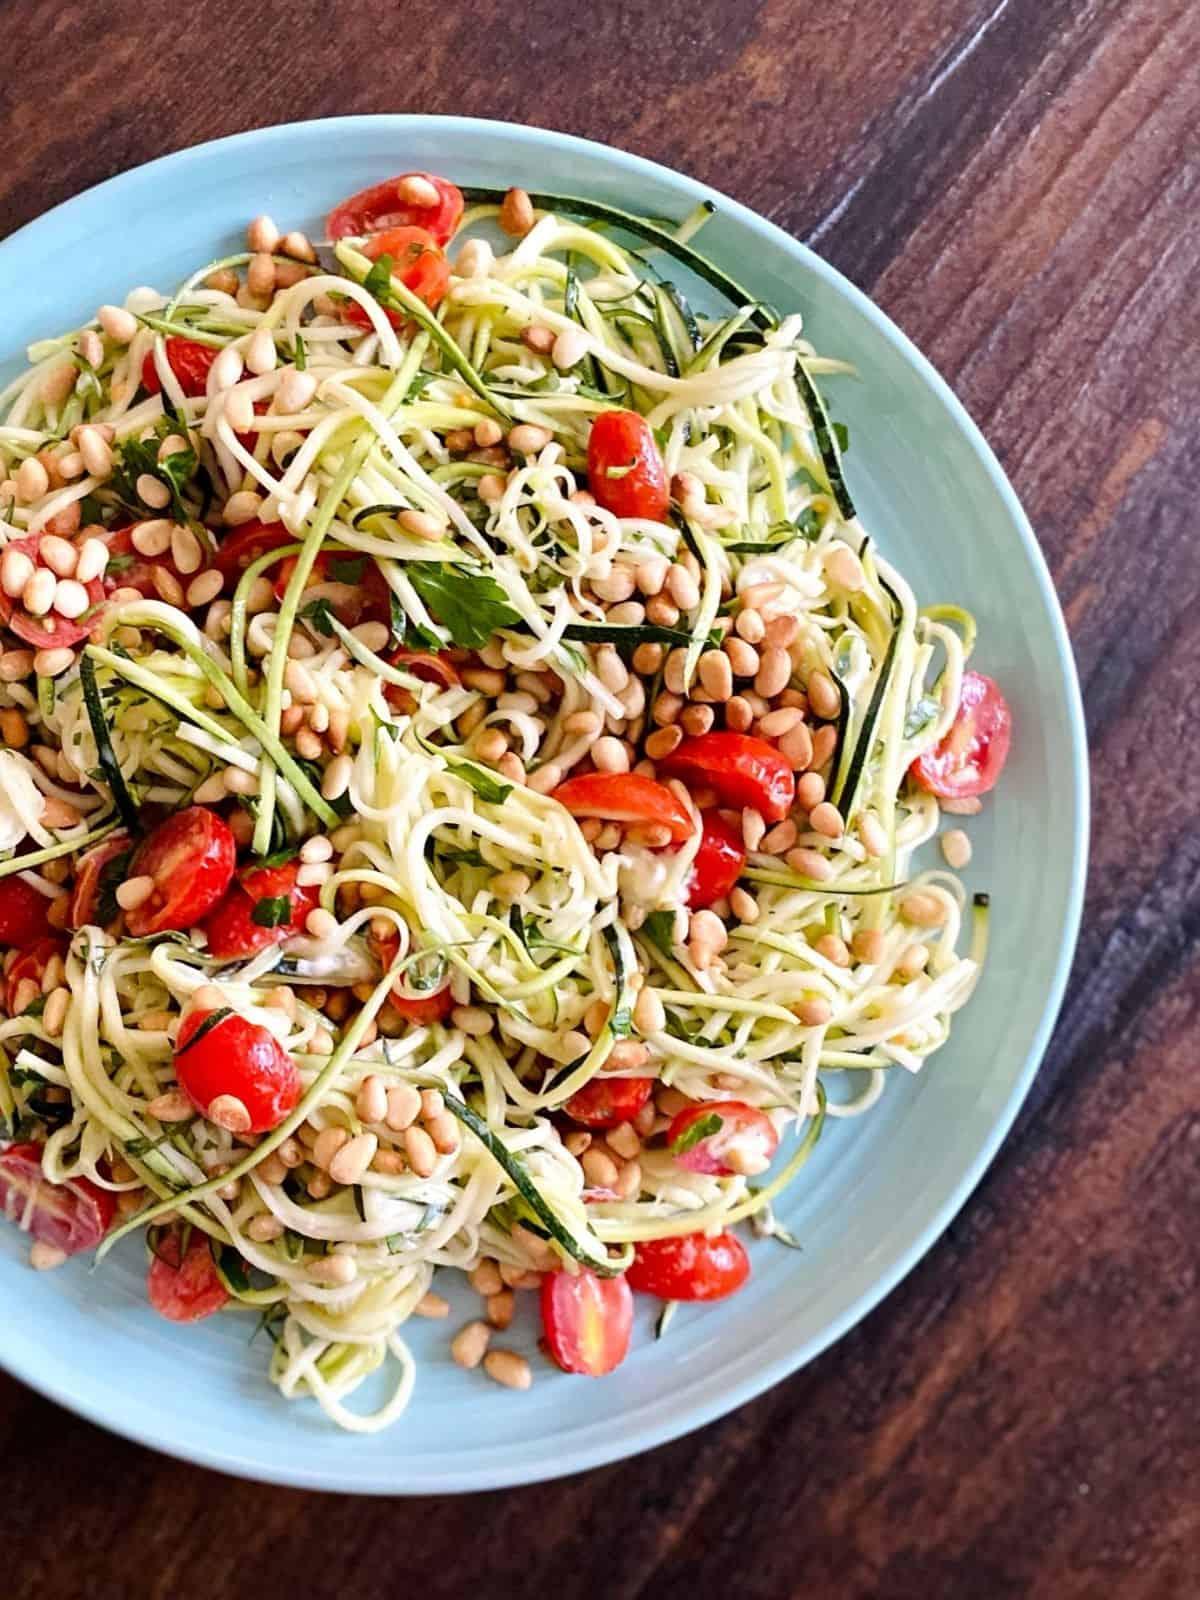 zucchini, tomato, pine nut salad in blue bowl